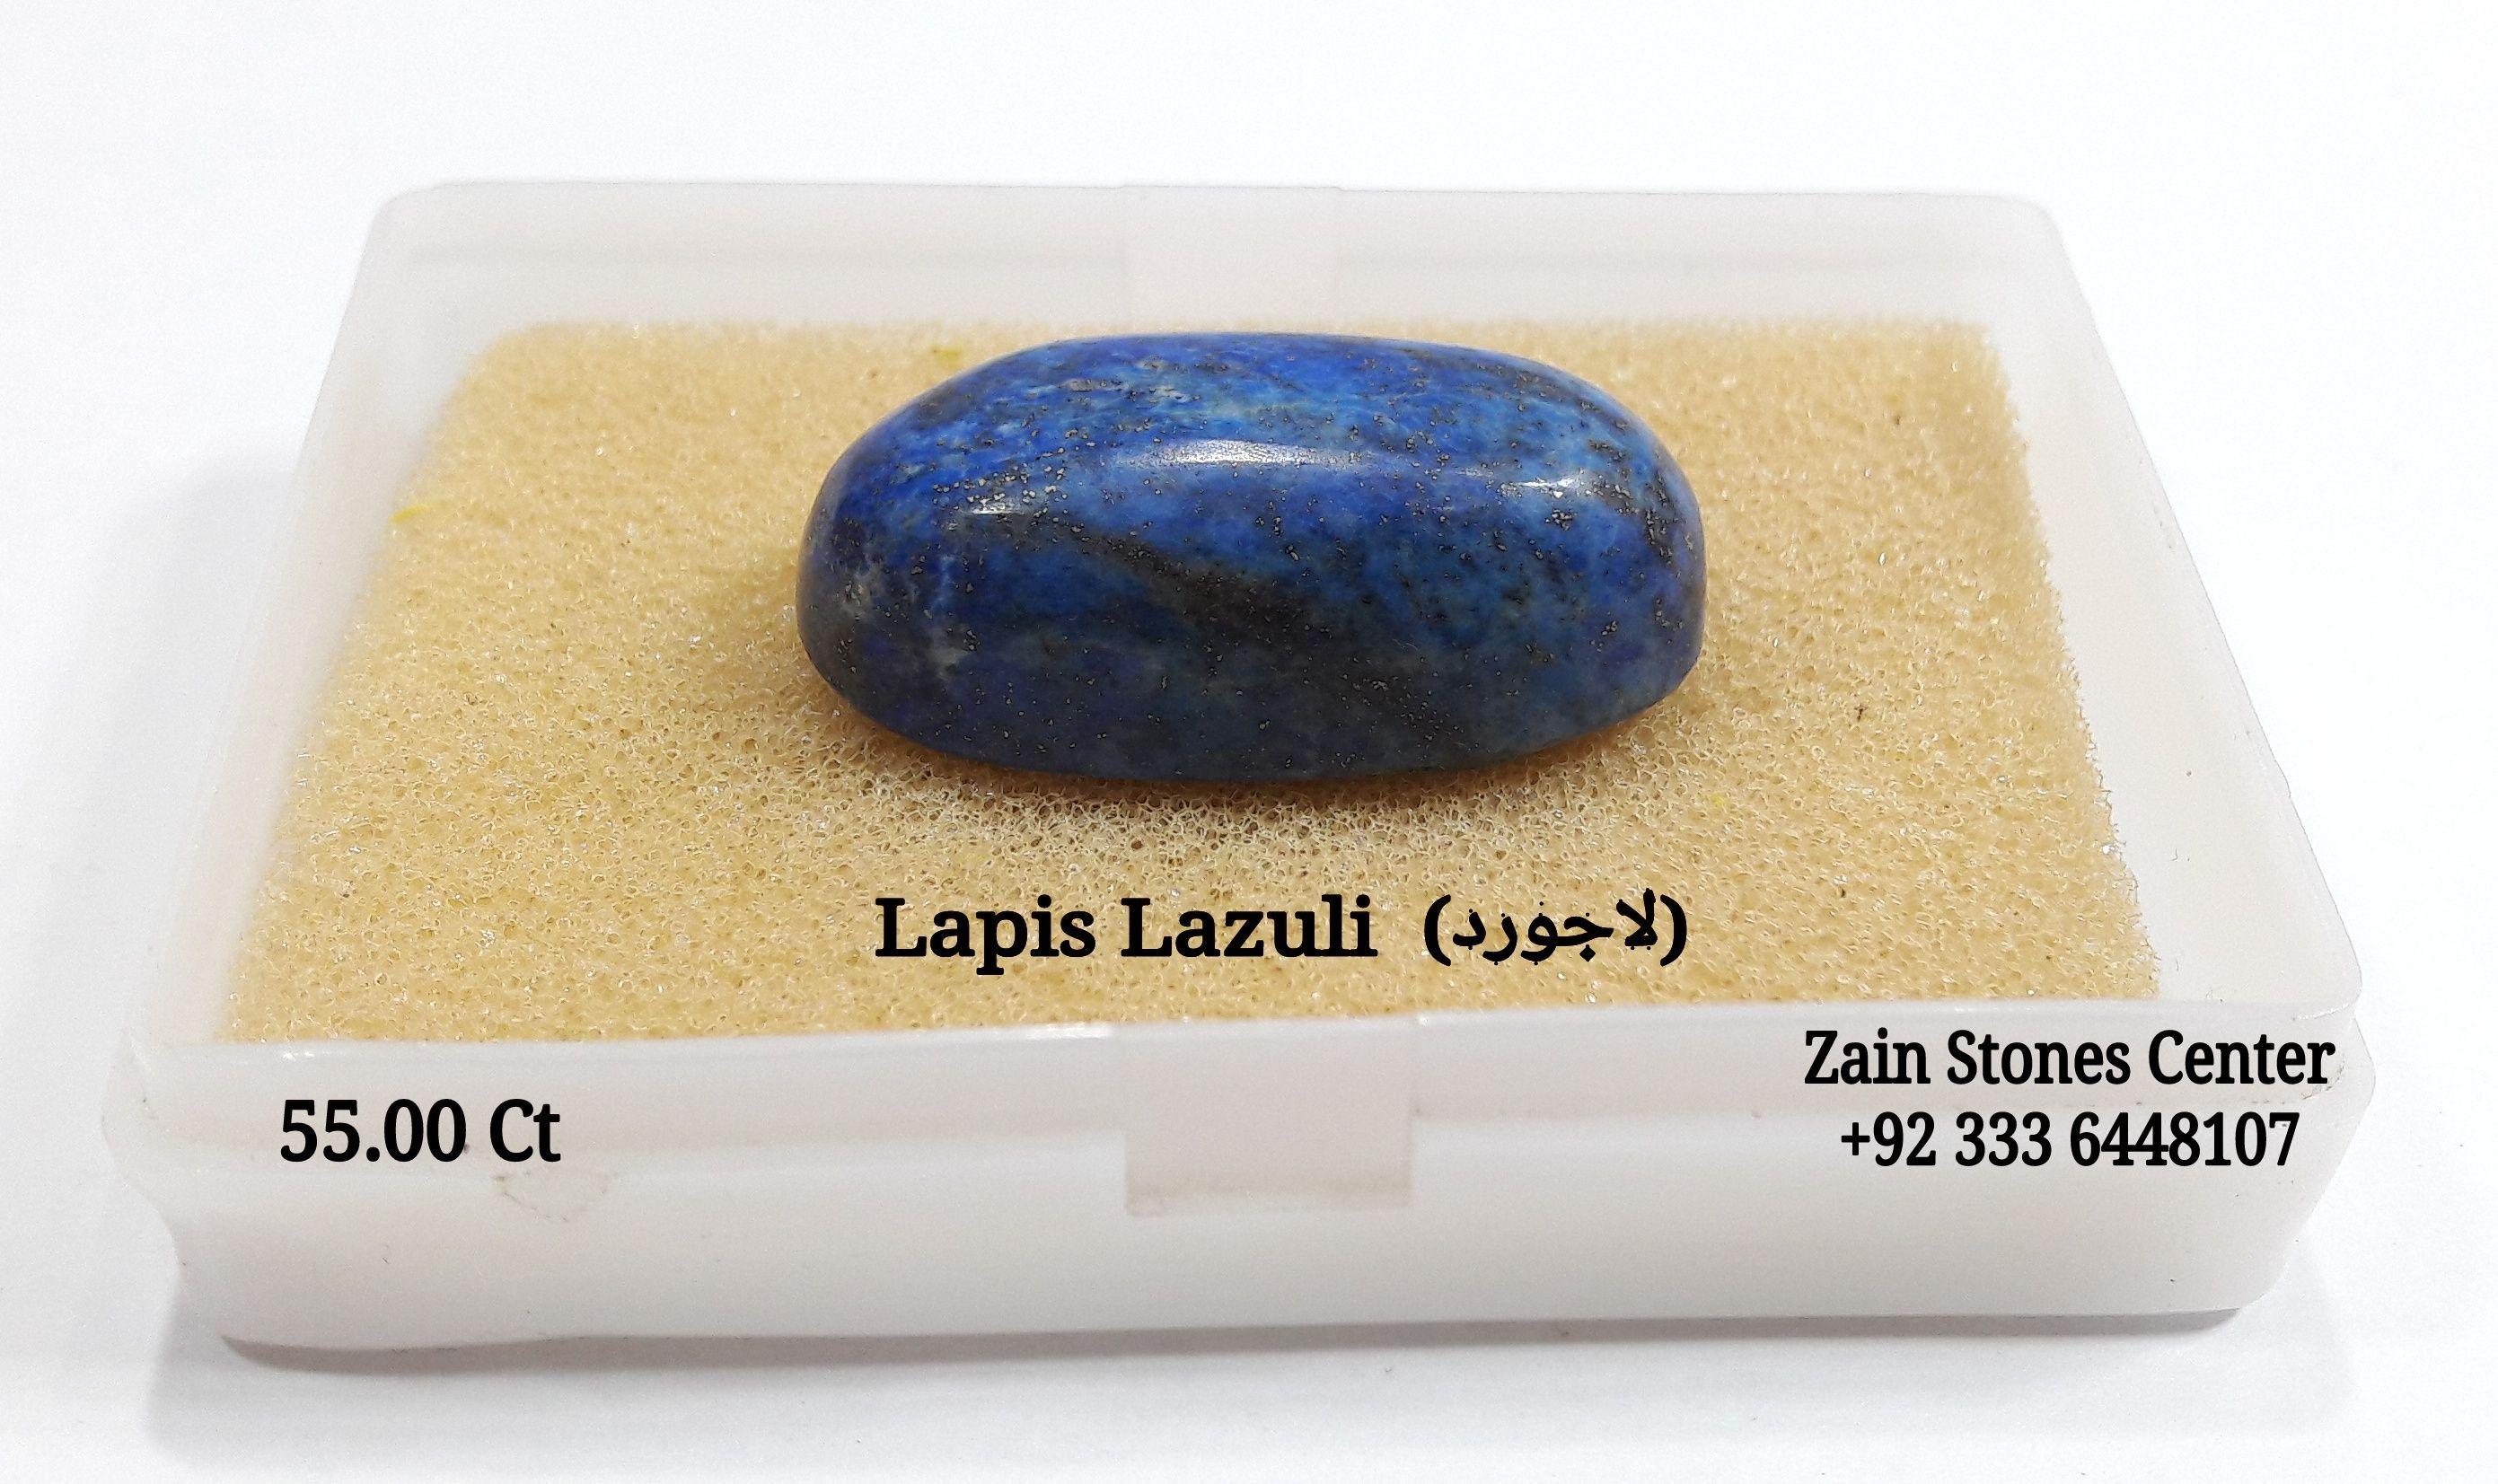 Pin On Lajward Stone Lapis Lazuli Stone